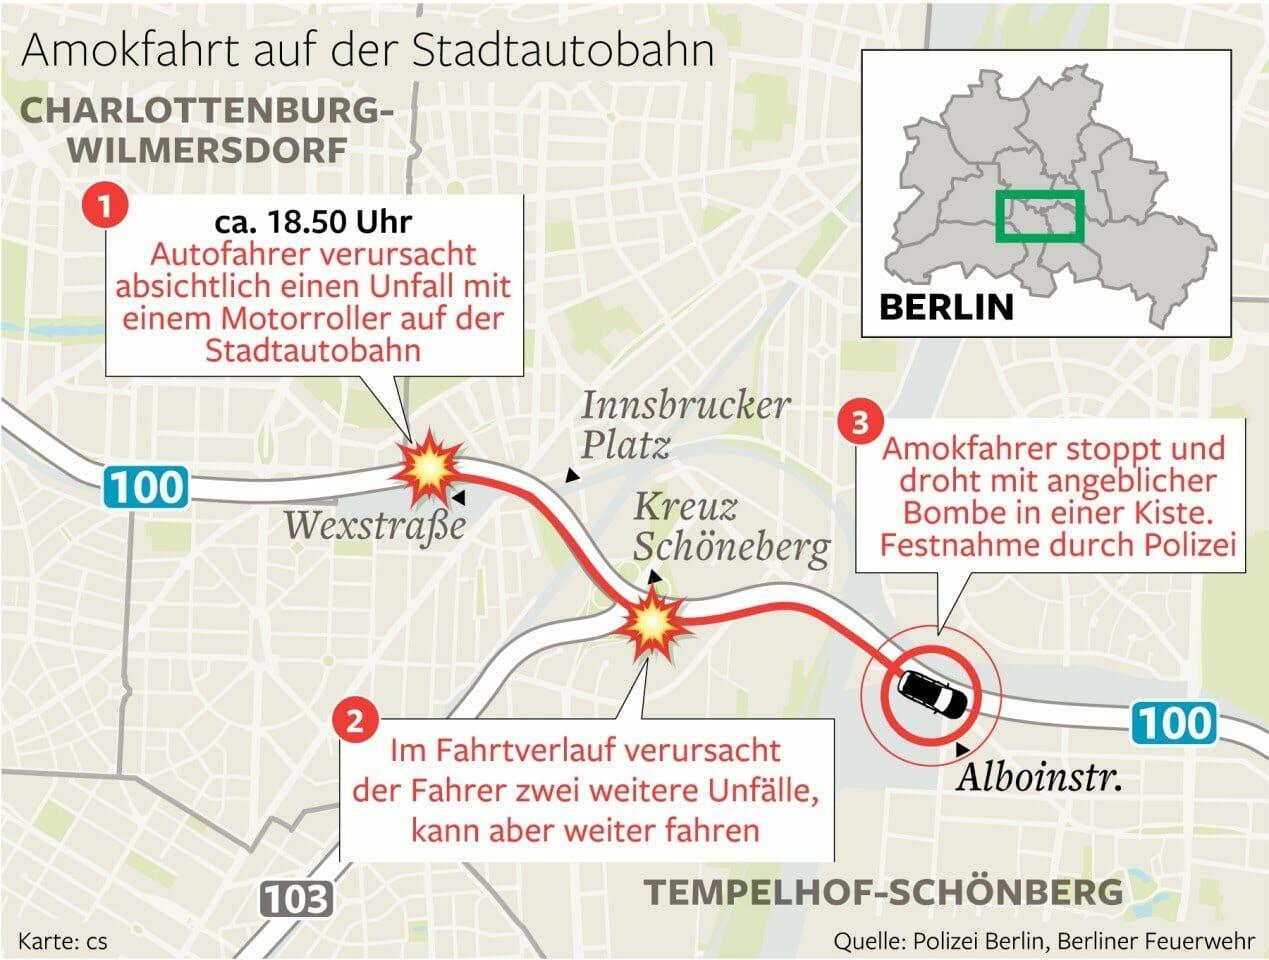 Berlin: Several motorcyclists rammed - Islamist attack?